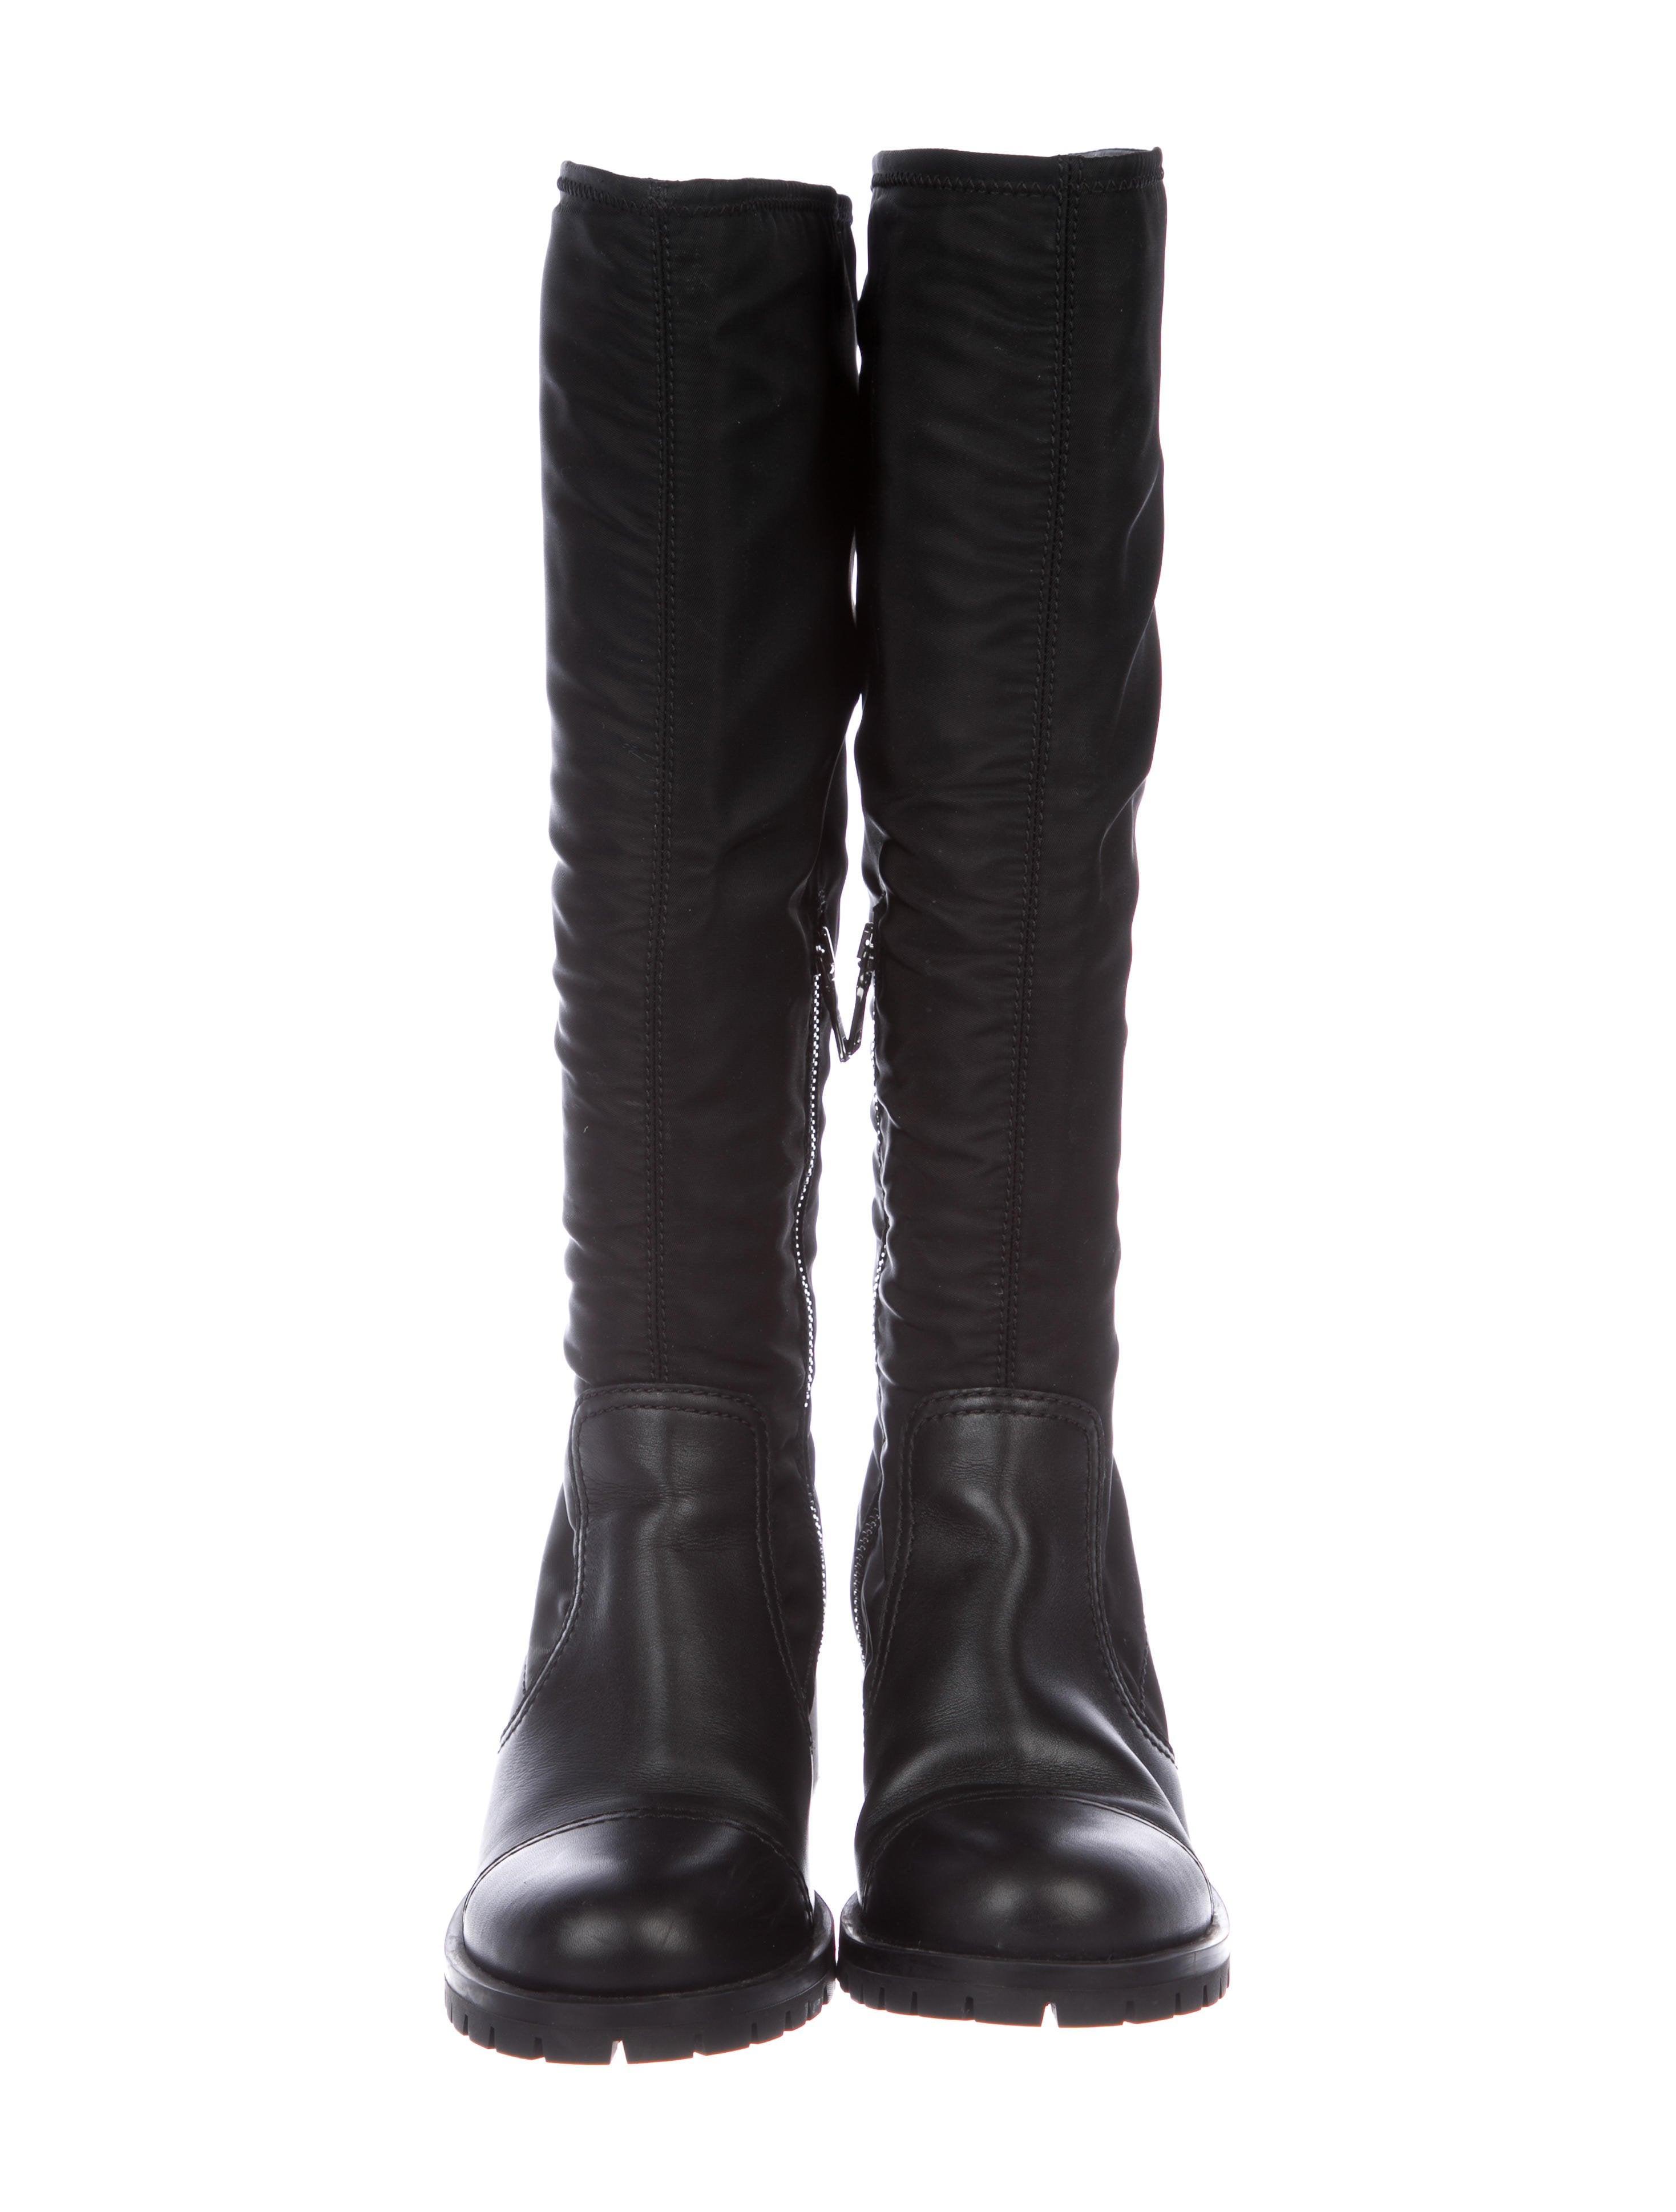 Prada Nylon Round-Toe Boots sale IrVQzM